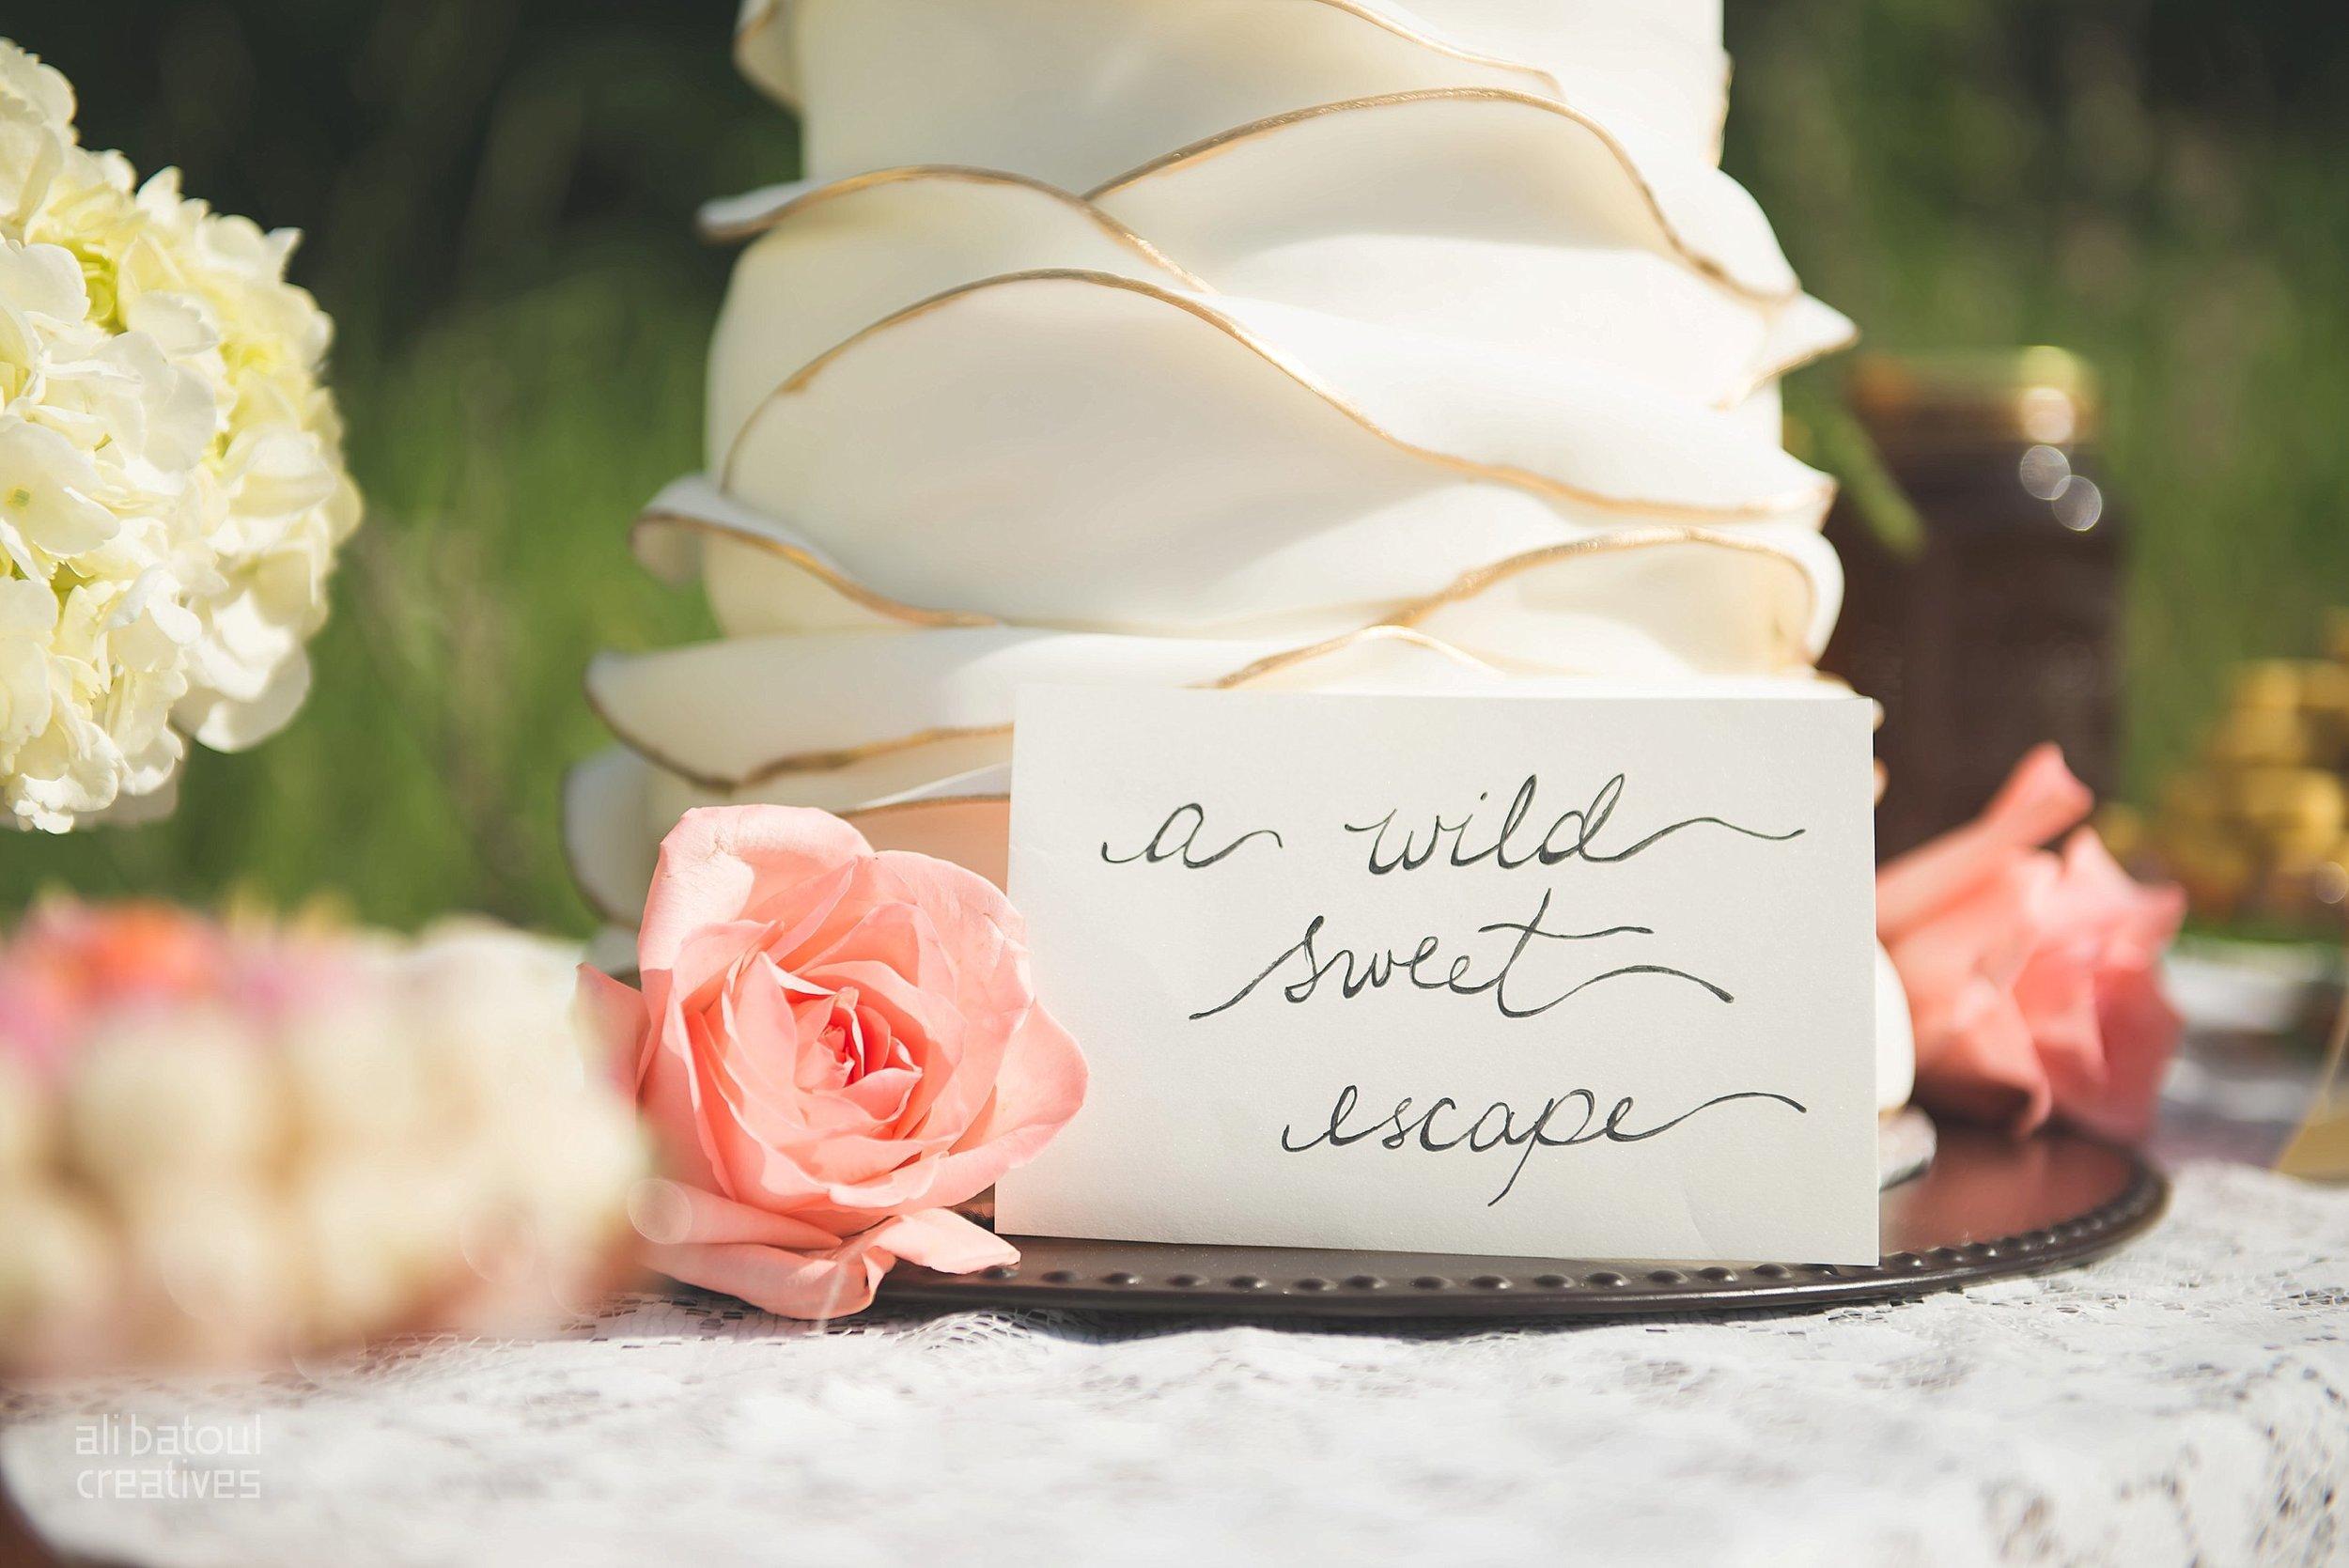 6 A Wild Sweet Escape - Ali Batoul Creatives-55_WEB